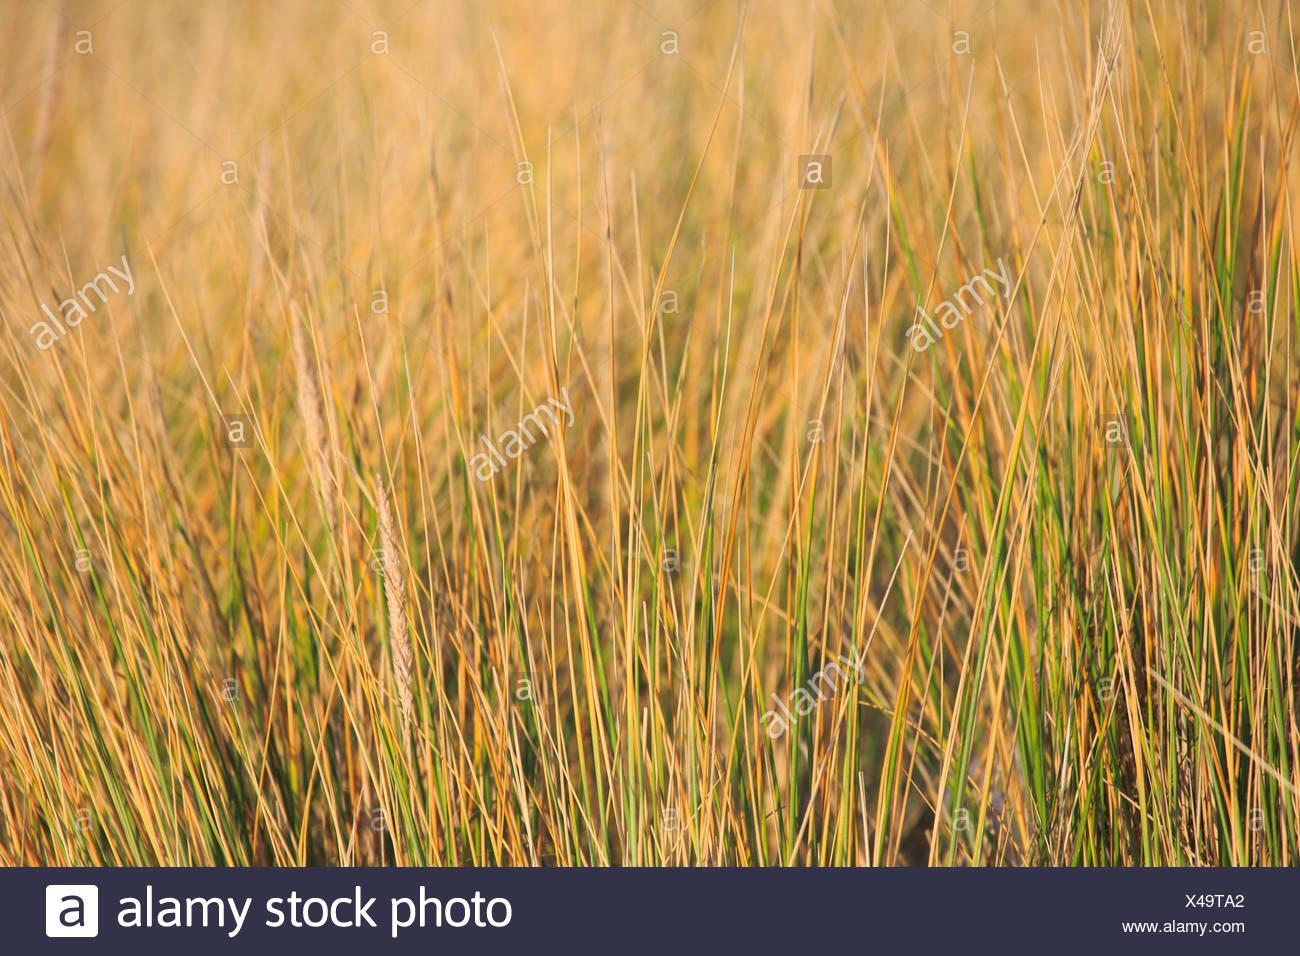 Germany, Europe, dune, dune grass, blade of grass, Helgoland, coastal vegetation, macro, sea, seashore, pattern, nature, North Se - Stock Image